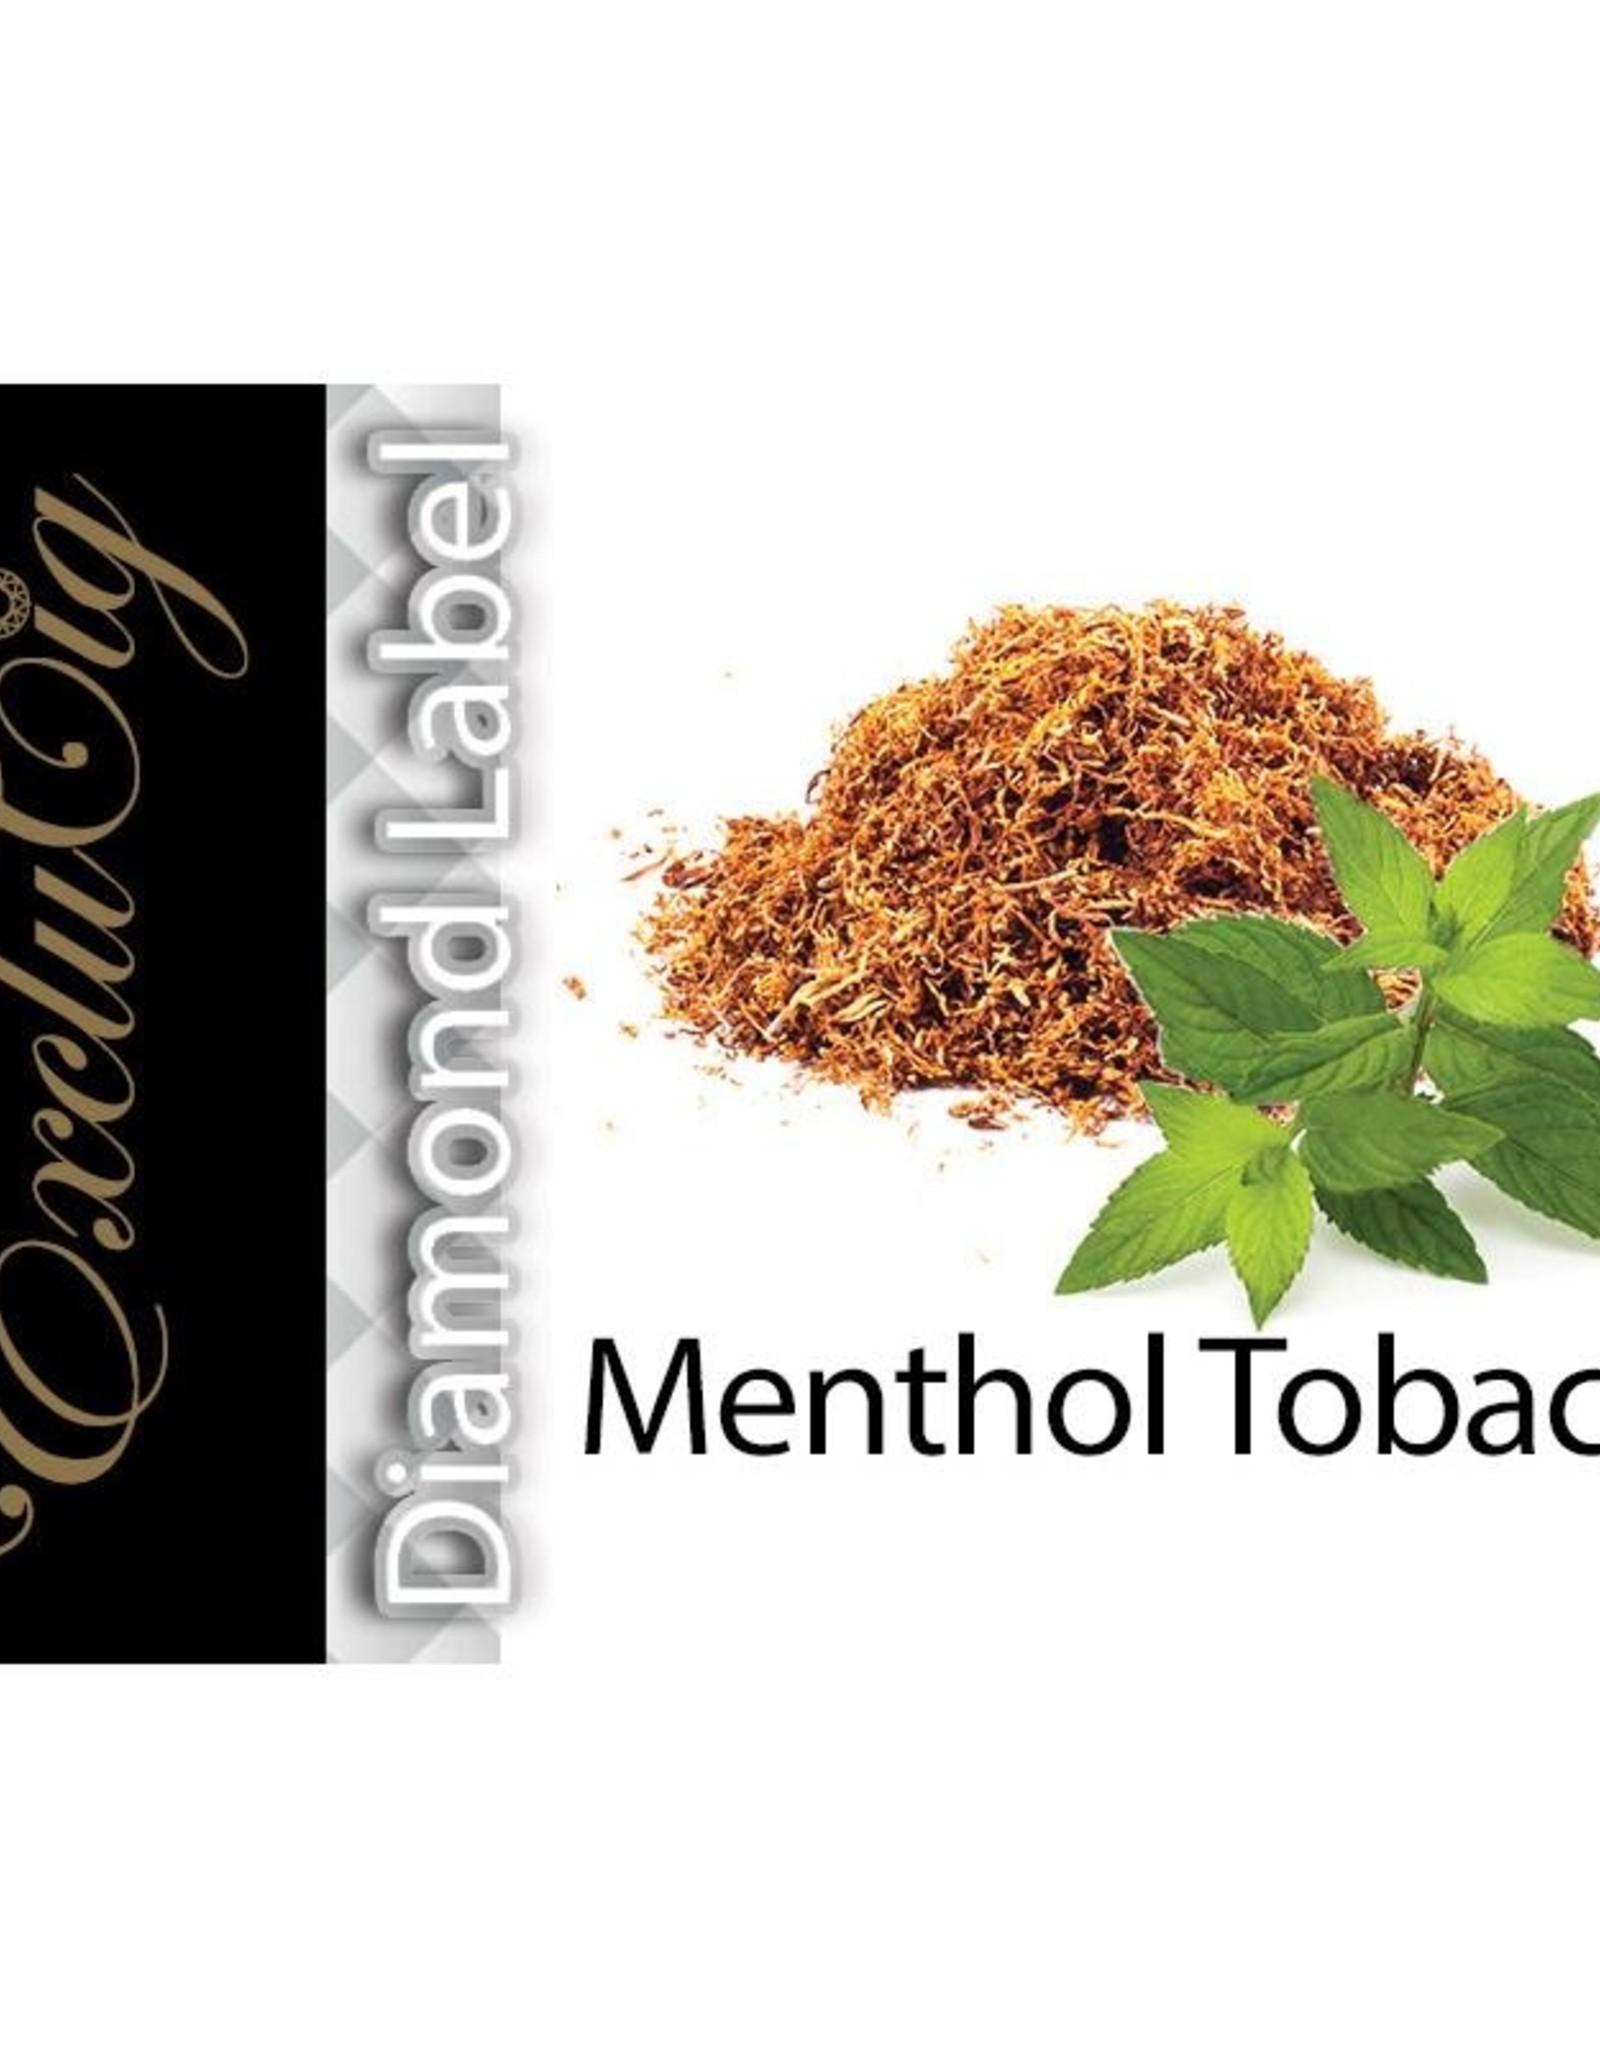 Exclucig Exclucig Diamond Label E-liquid Menthol Tobacco 18 mg Nicotine